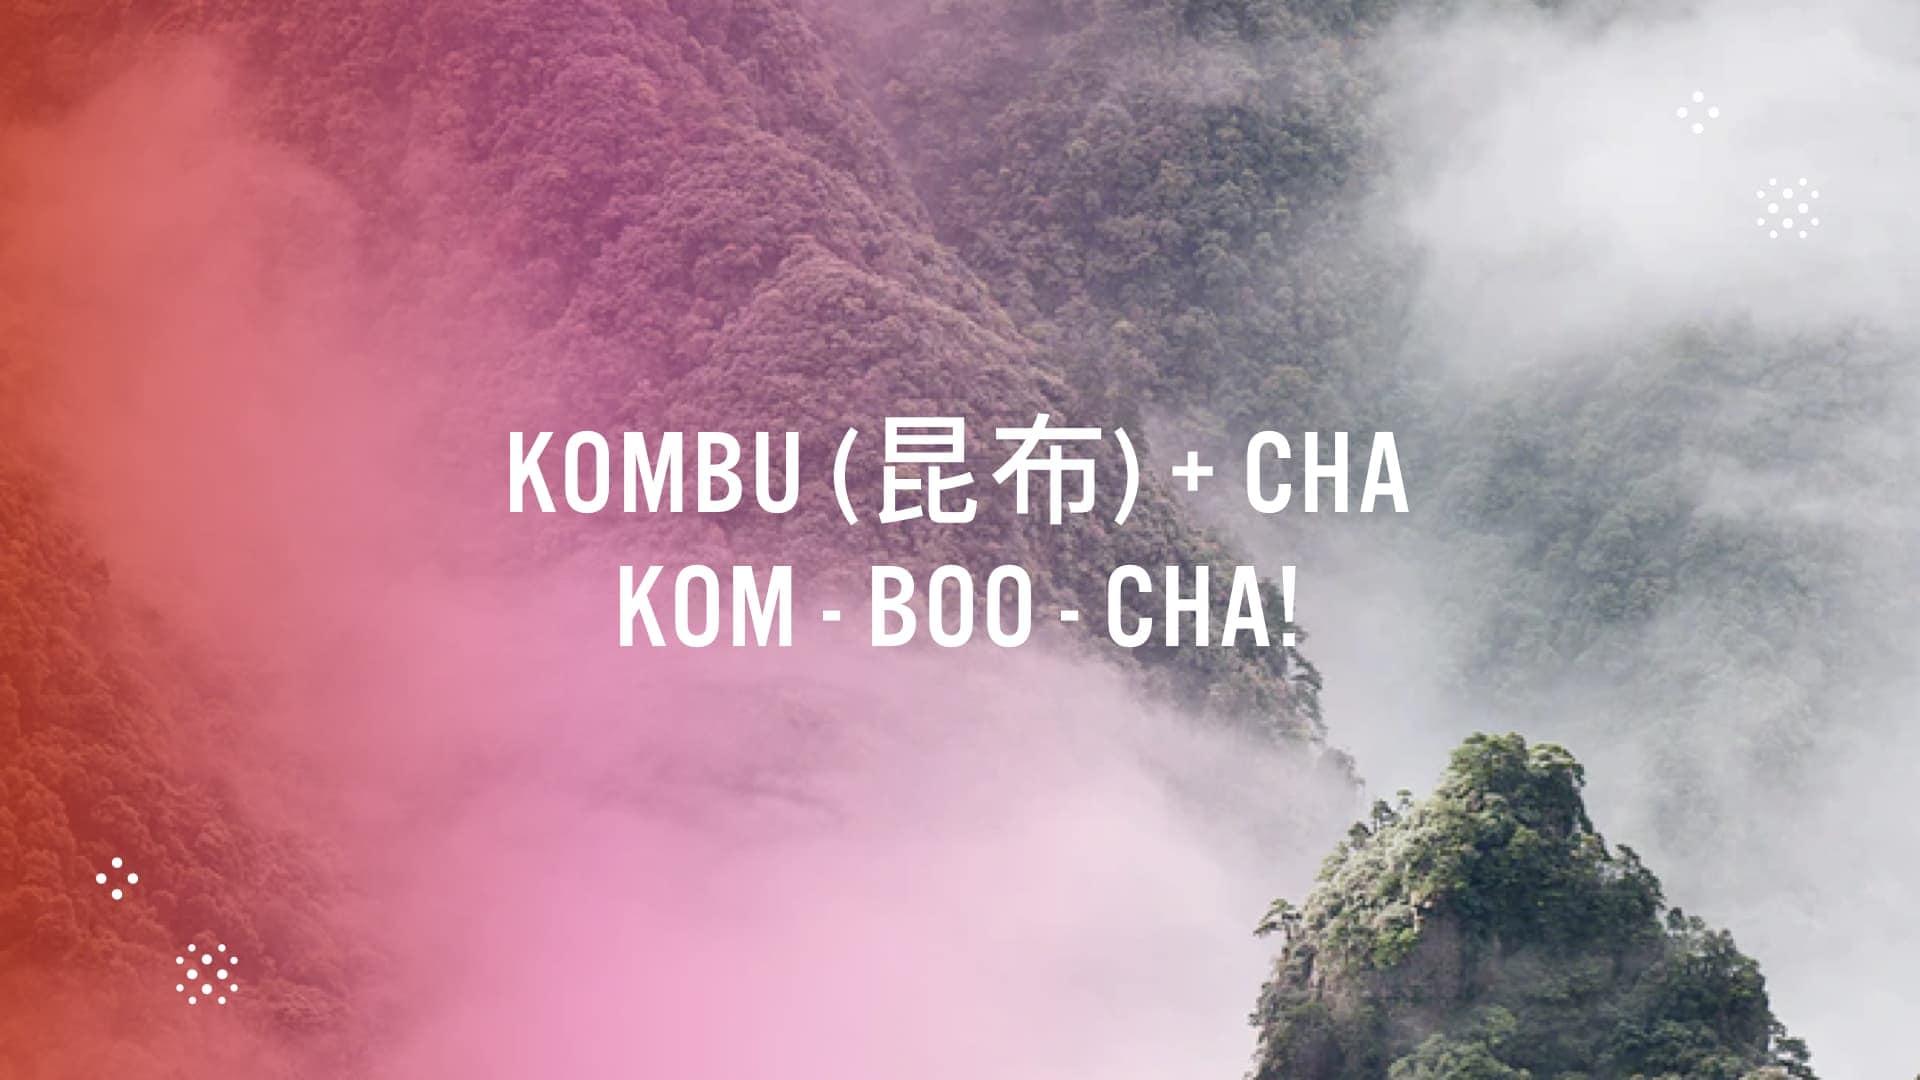 phonetic pronunciation of the word kombucha